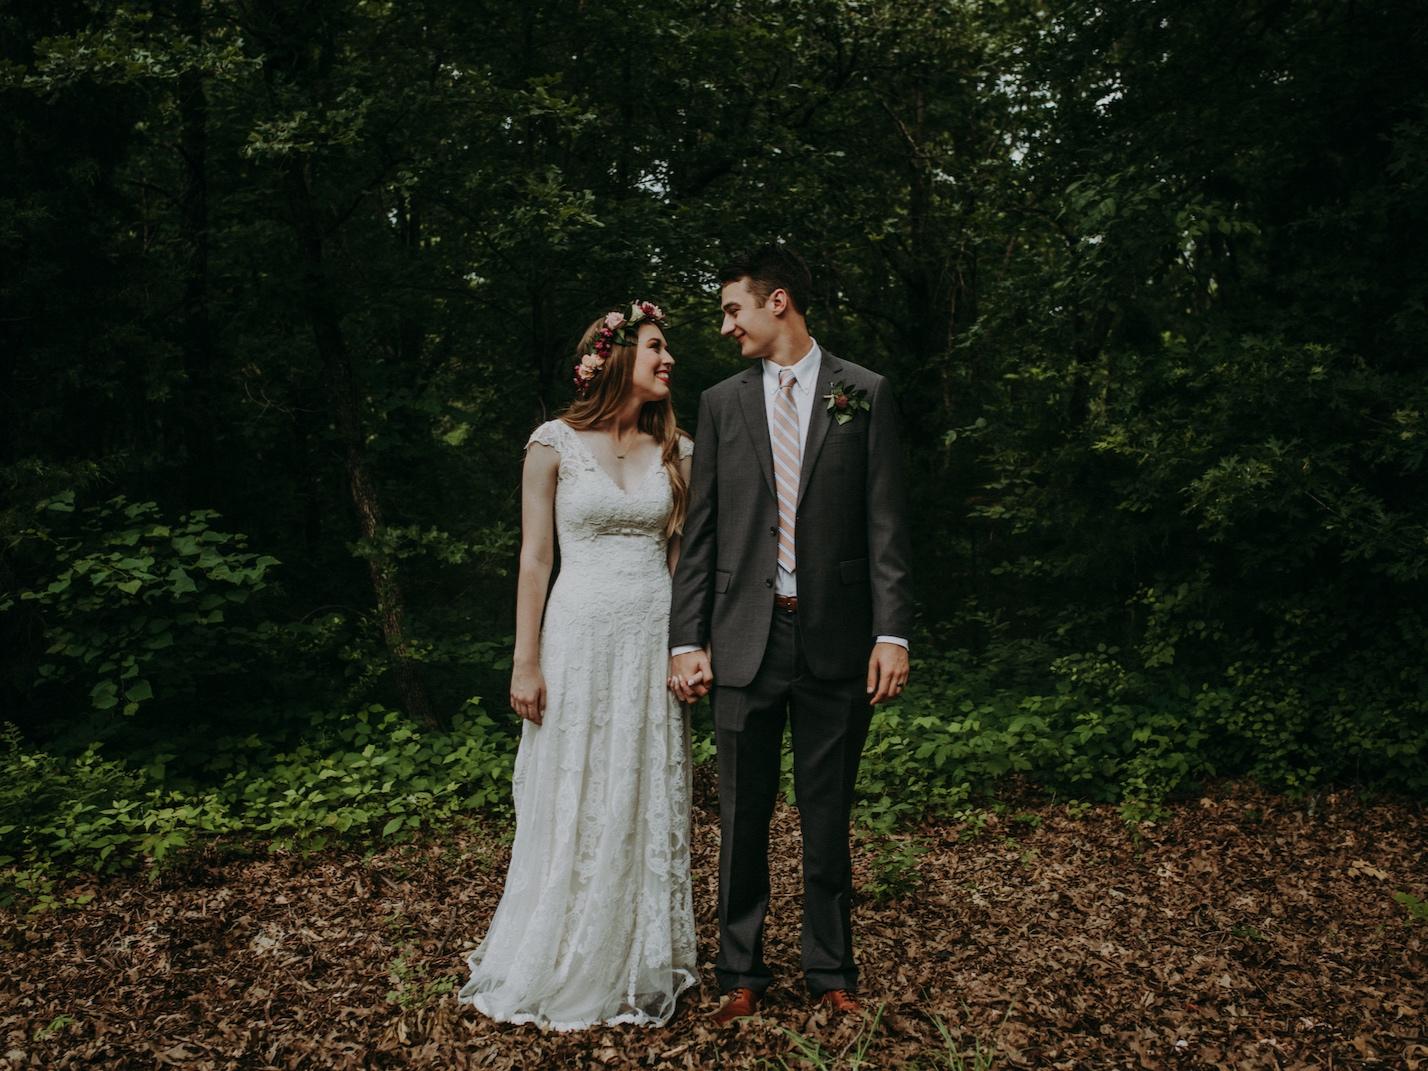 Oklahoma+City+Wedding+Photographer+Package121.jpg